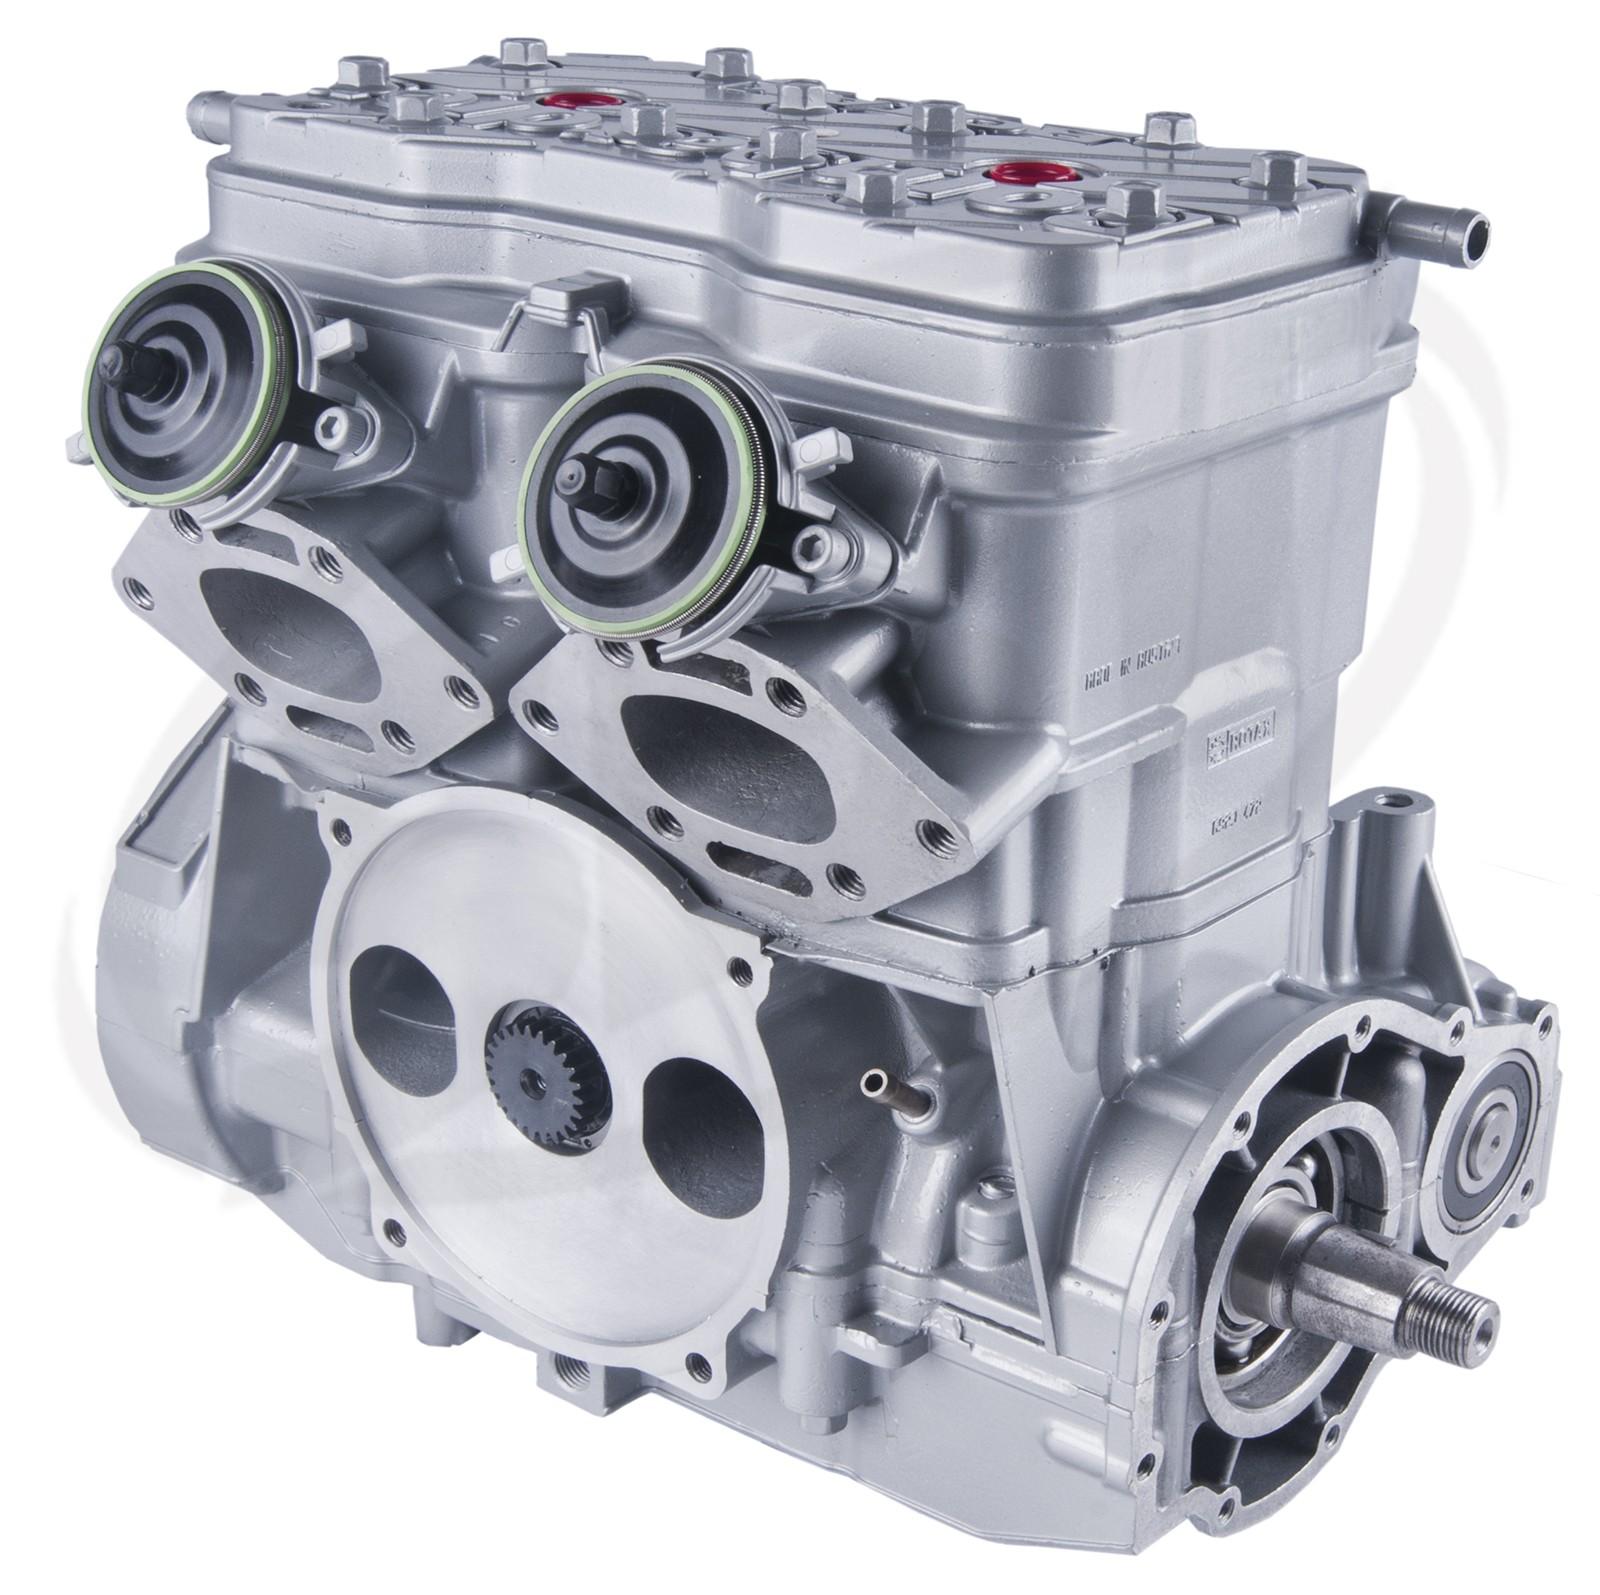 Rotax Engine Diagram Sea Doo Standard Engine 787 800 Xp800 Xp Gsx Gtx Spx Of Rotax Engine Diagram Ulpower Ul260i